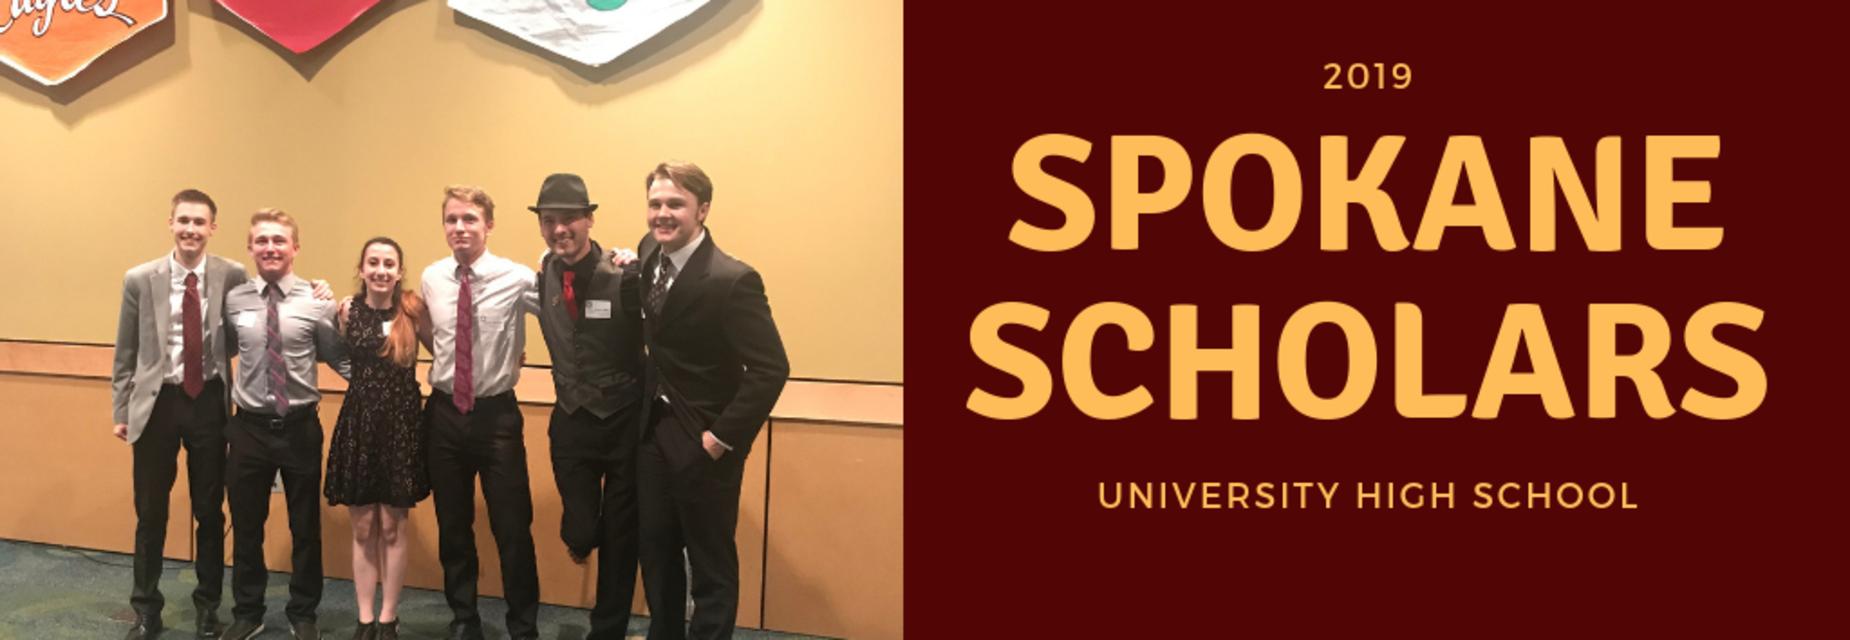 2019 Spokane Scholars